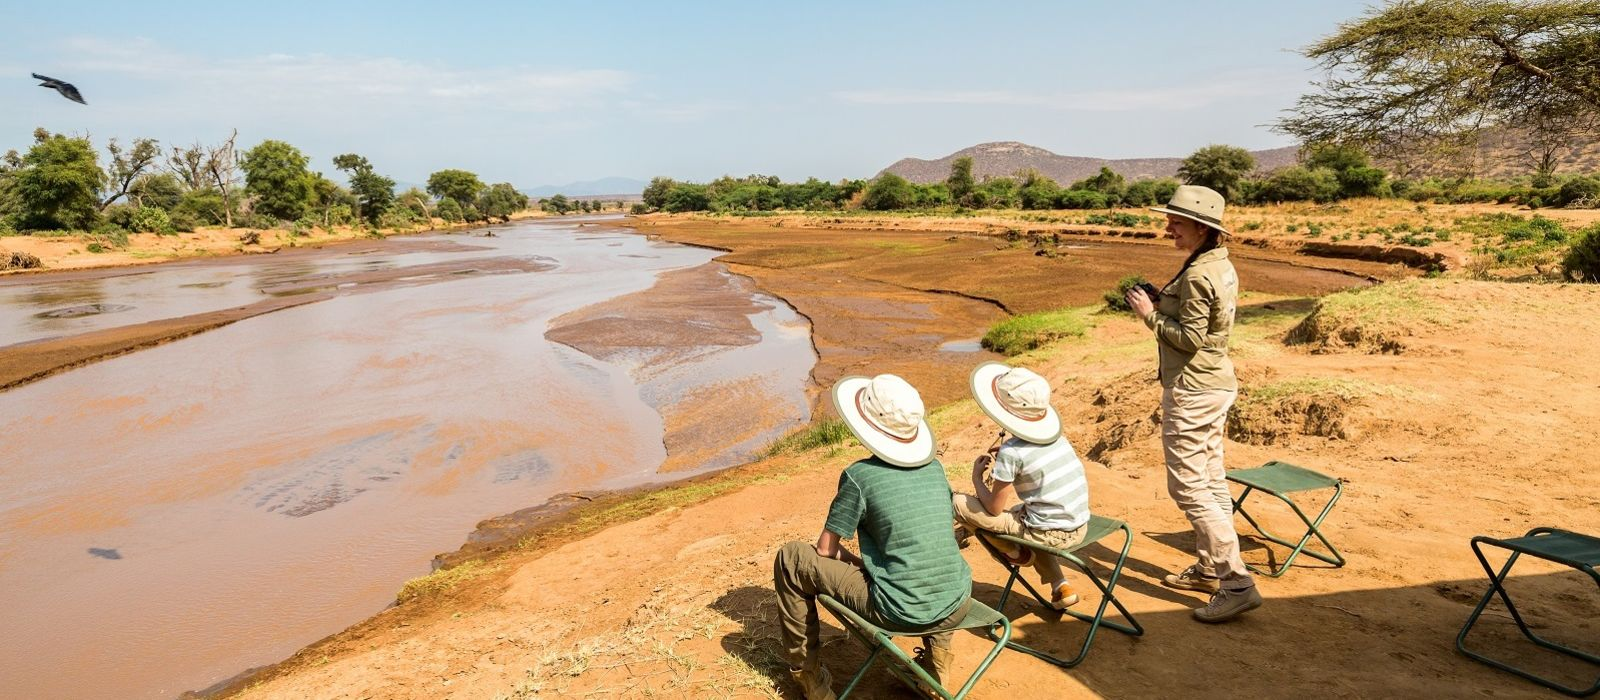 Klassisches Kenia: Samburu, Masai Mara & Strand Urlaub 3